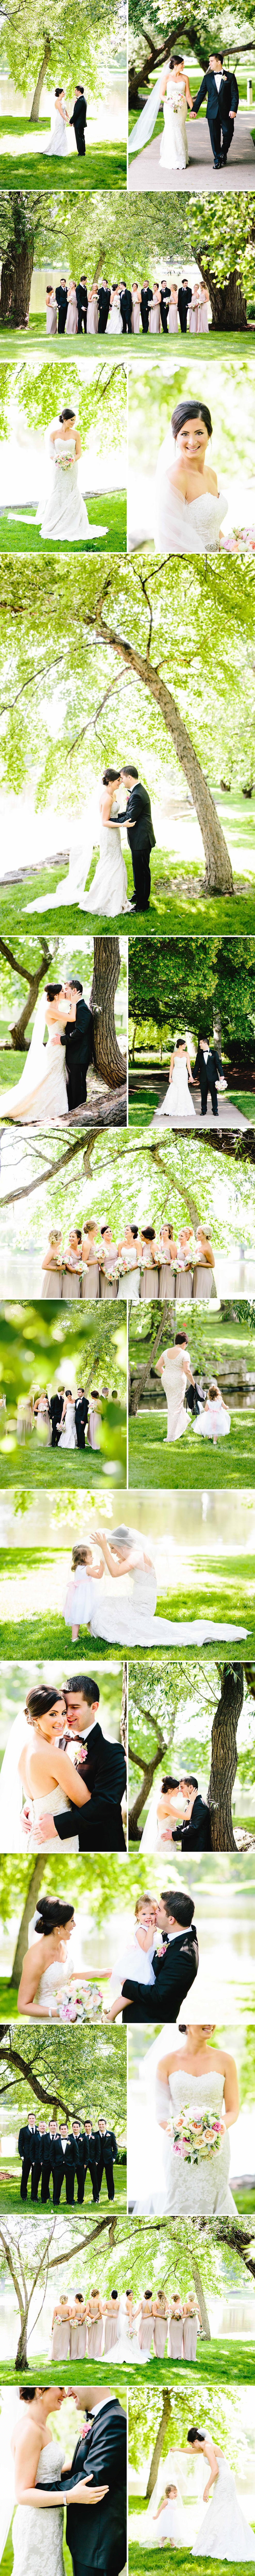 chicago-fine-art-wedding-photography-marshall3